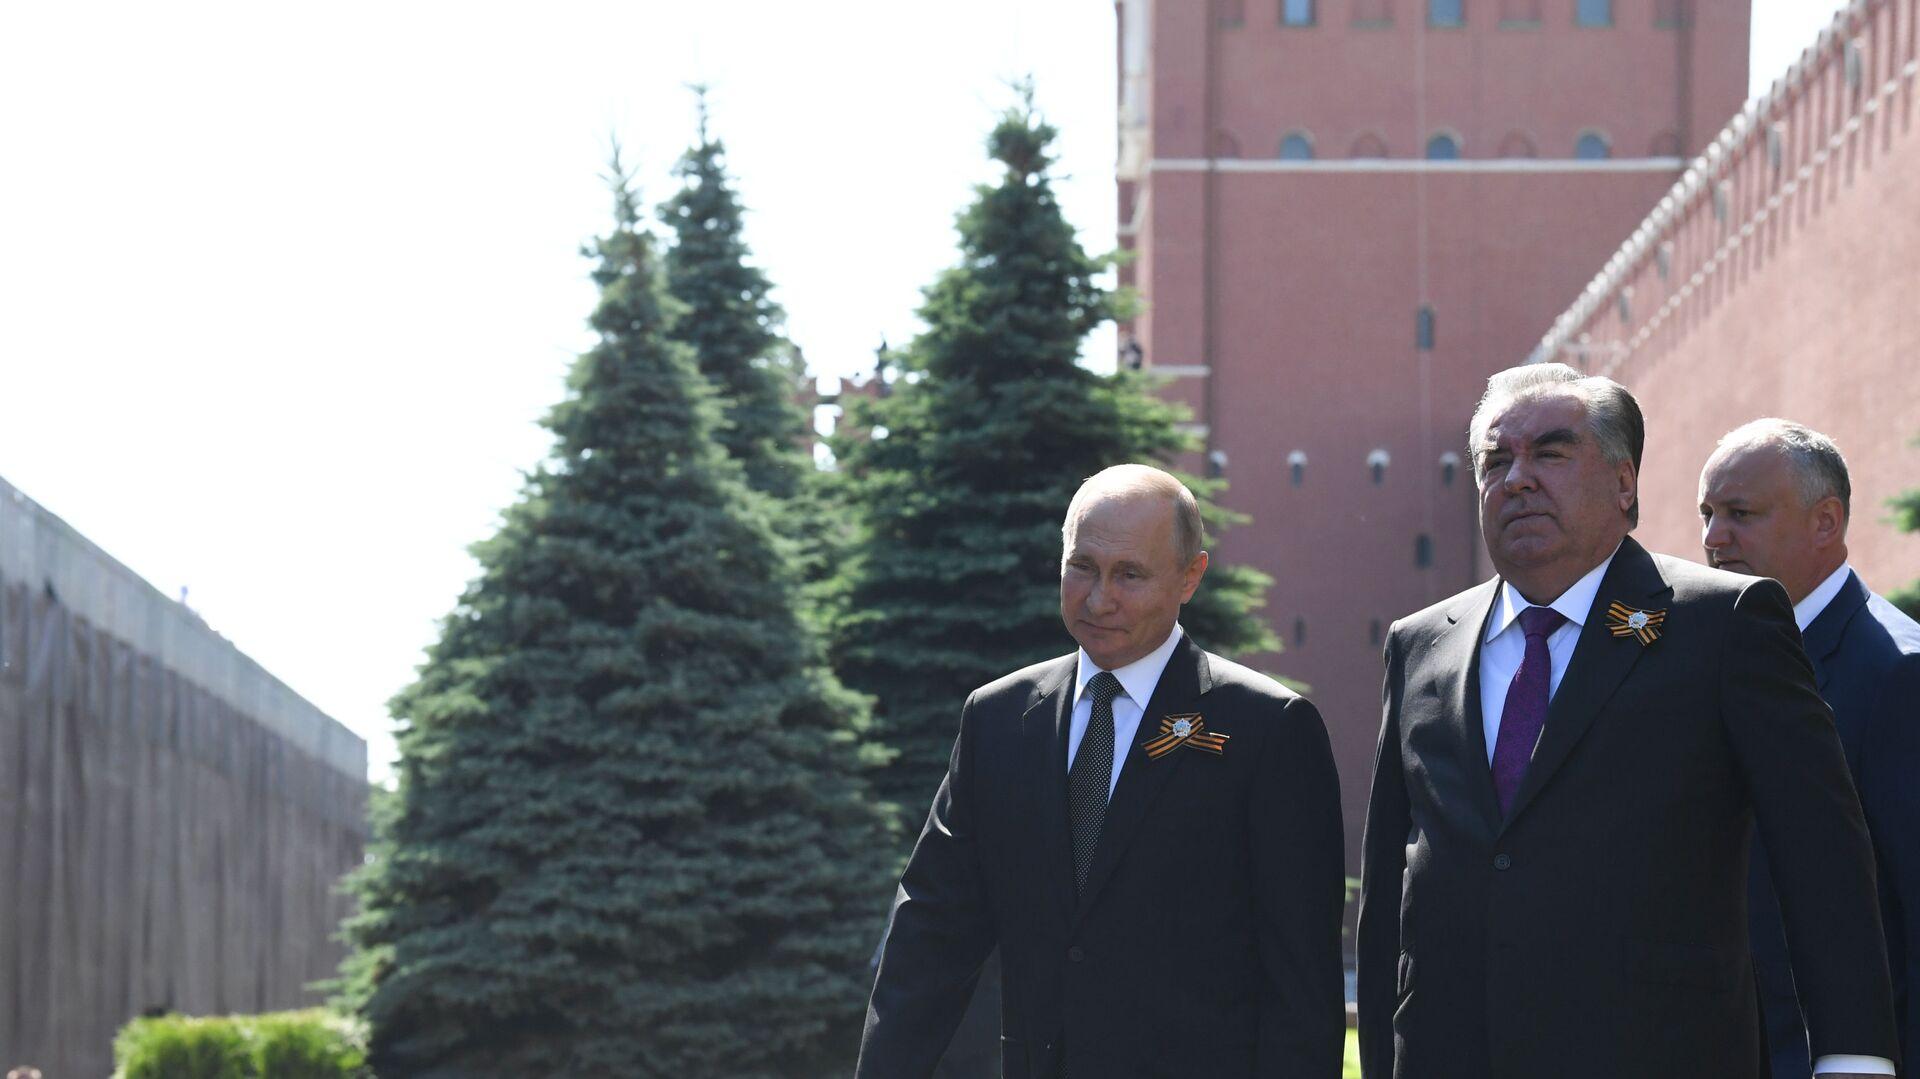 Президент России Владимир Путин и президент Таджикистана Эмомали Рахмон - Sputnik Таджикистан, 1920, 07.05.2021